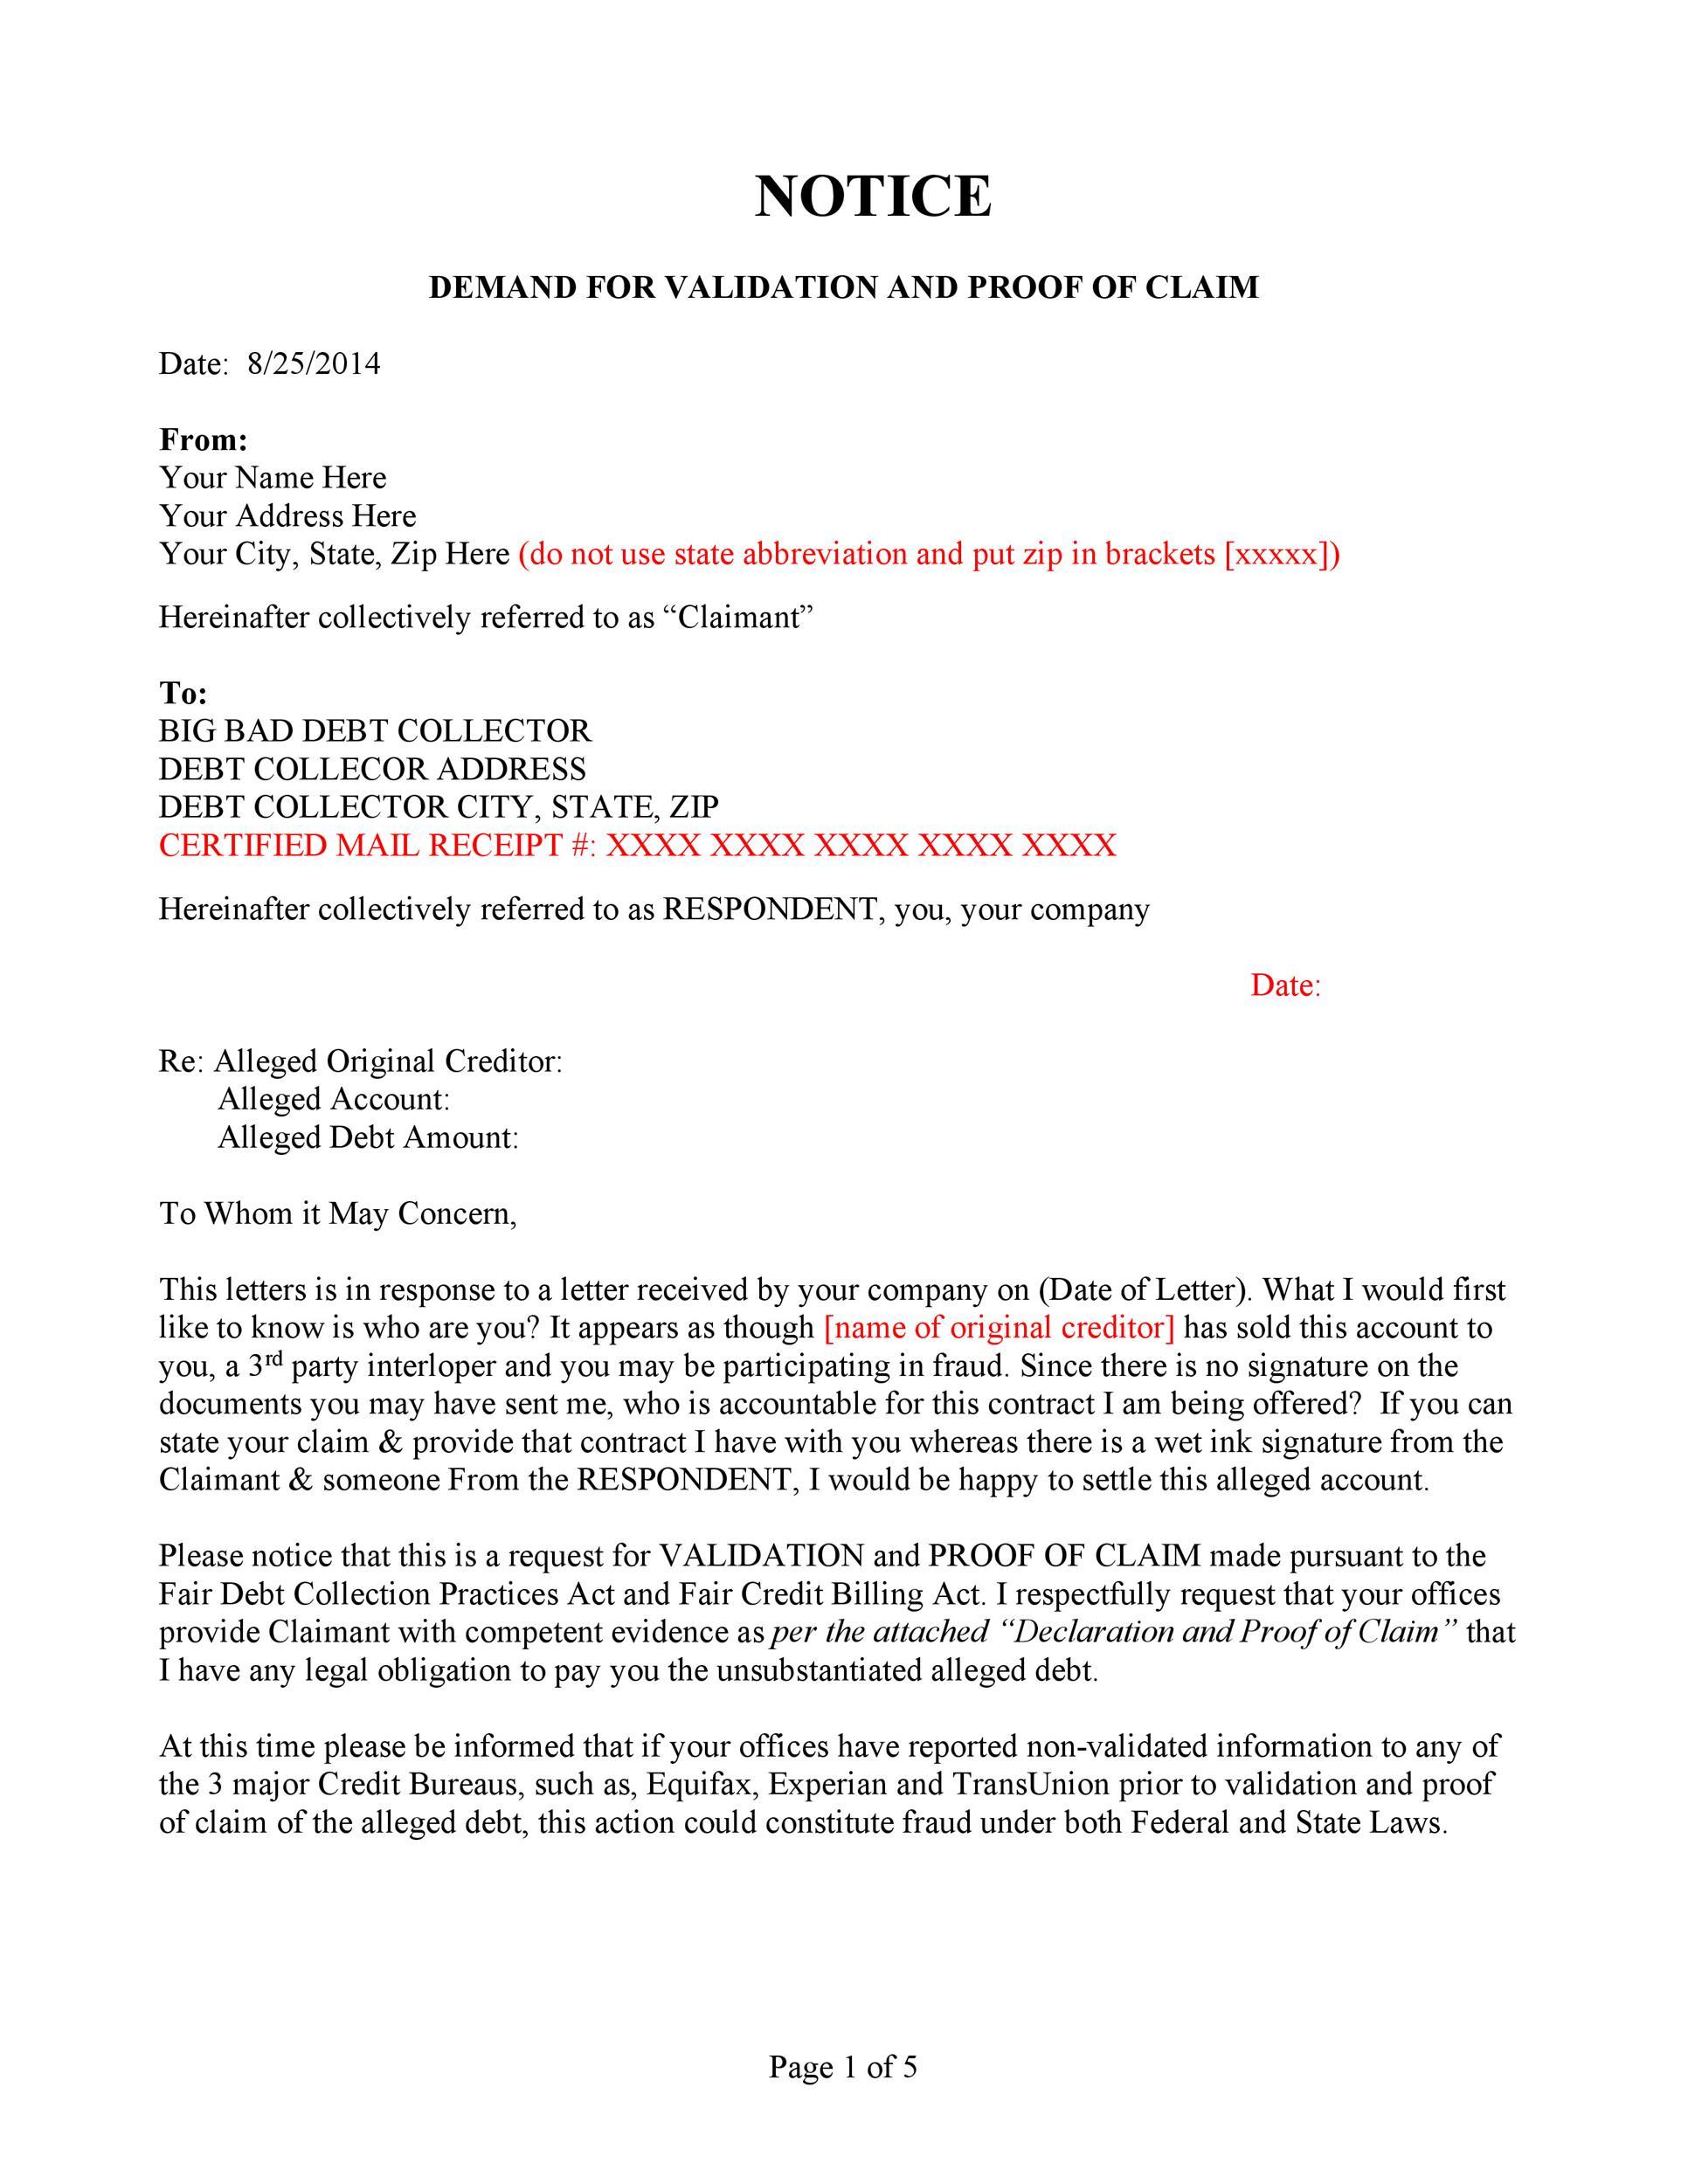 Free debt validation letter 29